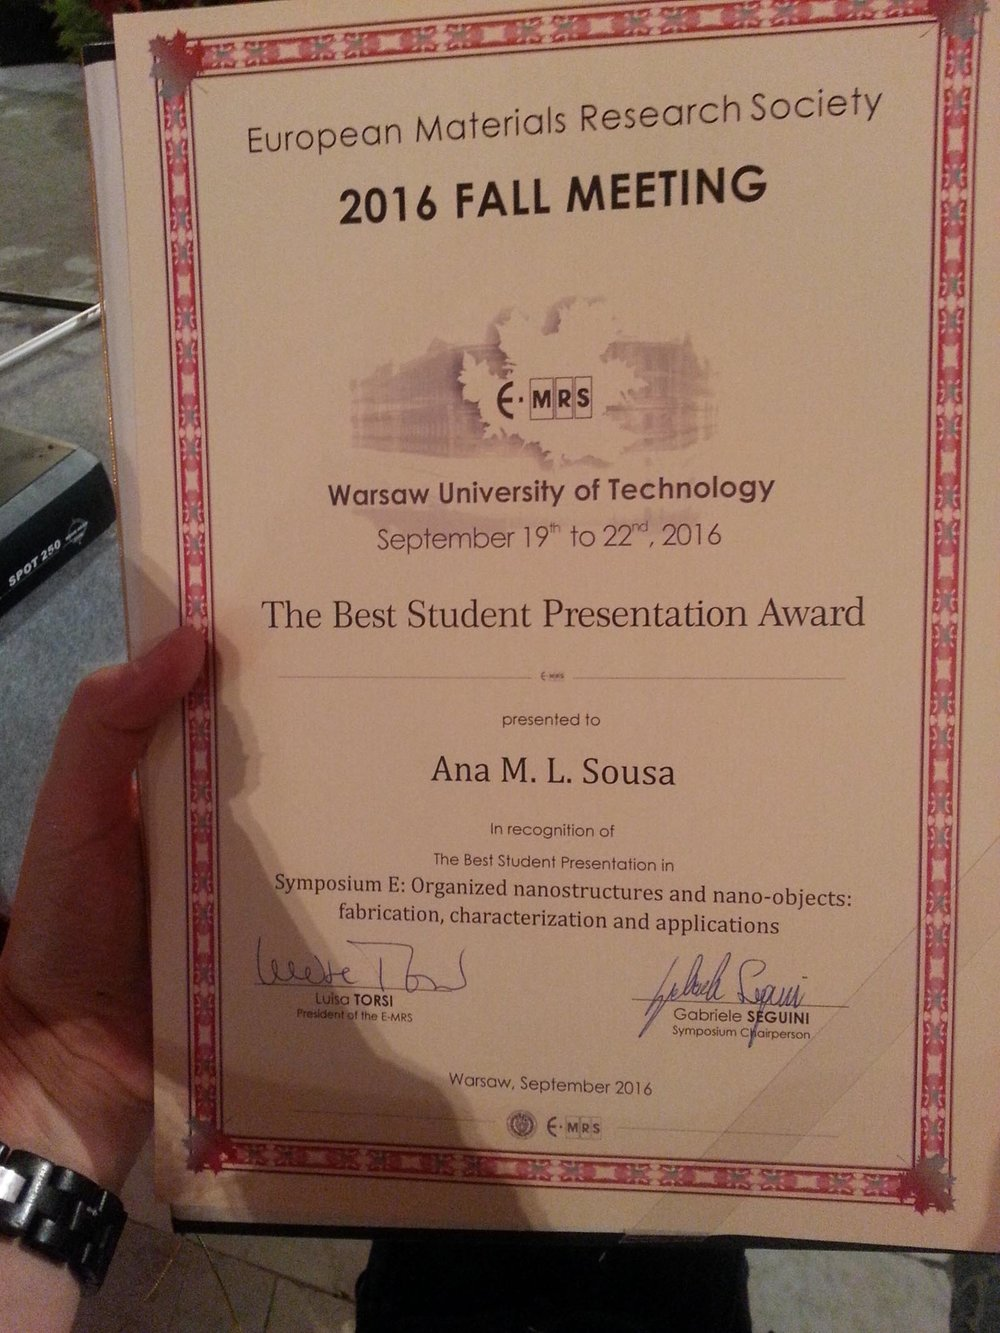 Ana wins best presentation award at e-mrs.